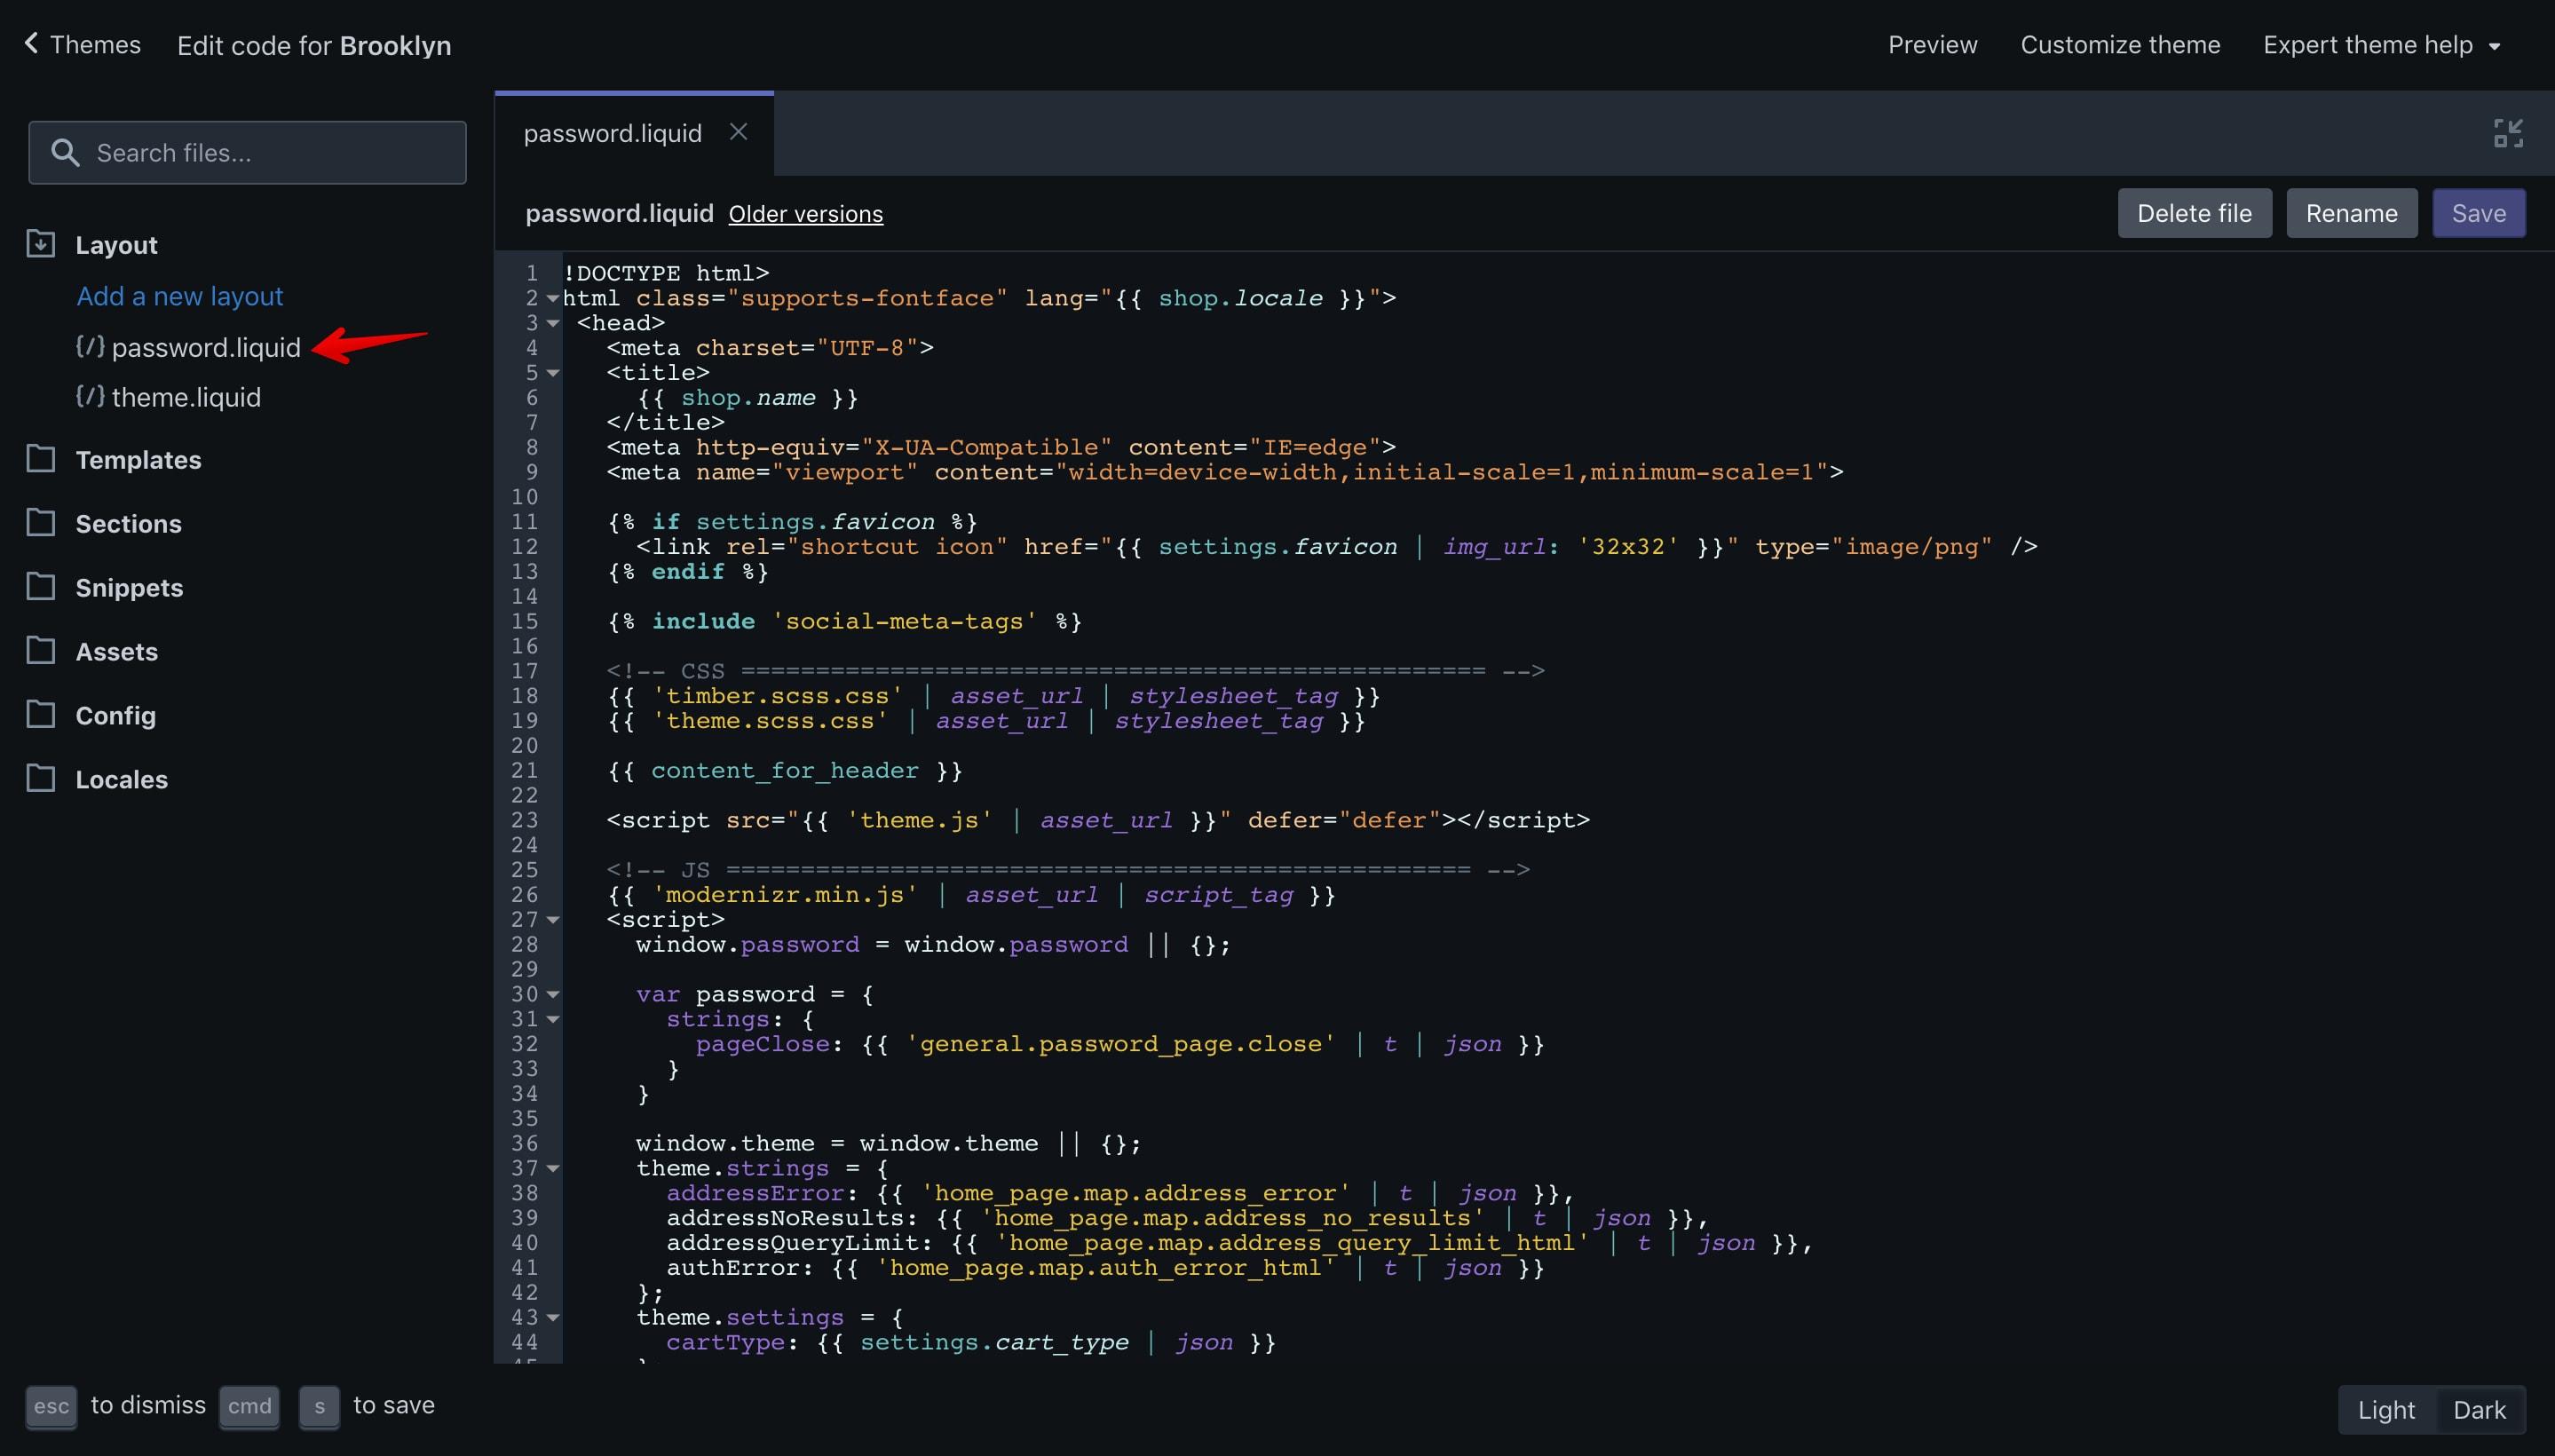 "Brooklyn theme ""password.liquid"" file opened in the code editor."